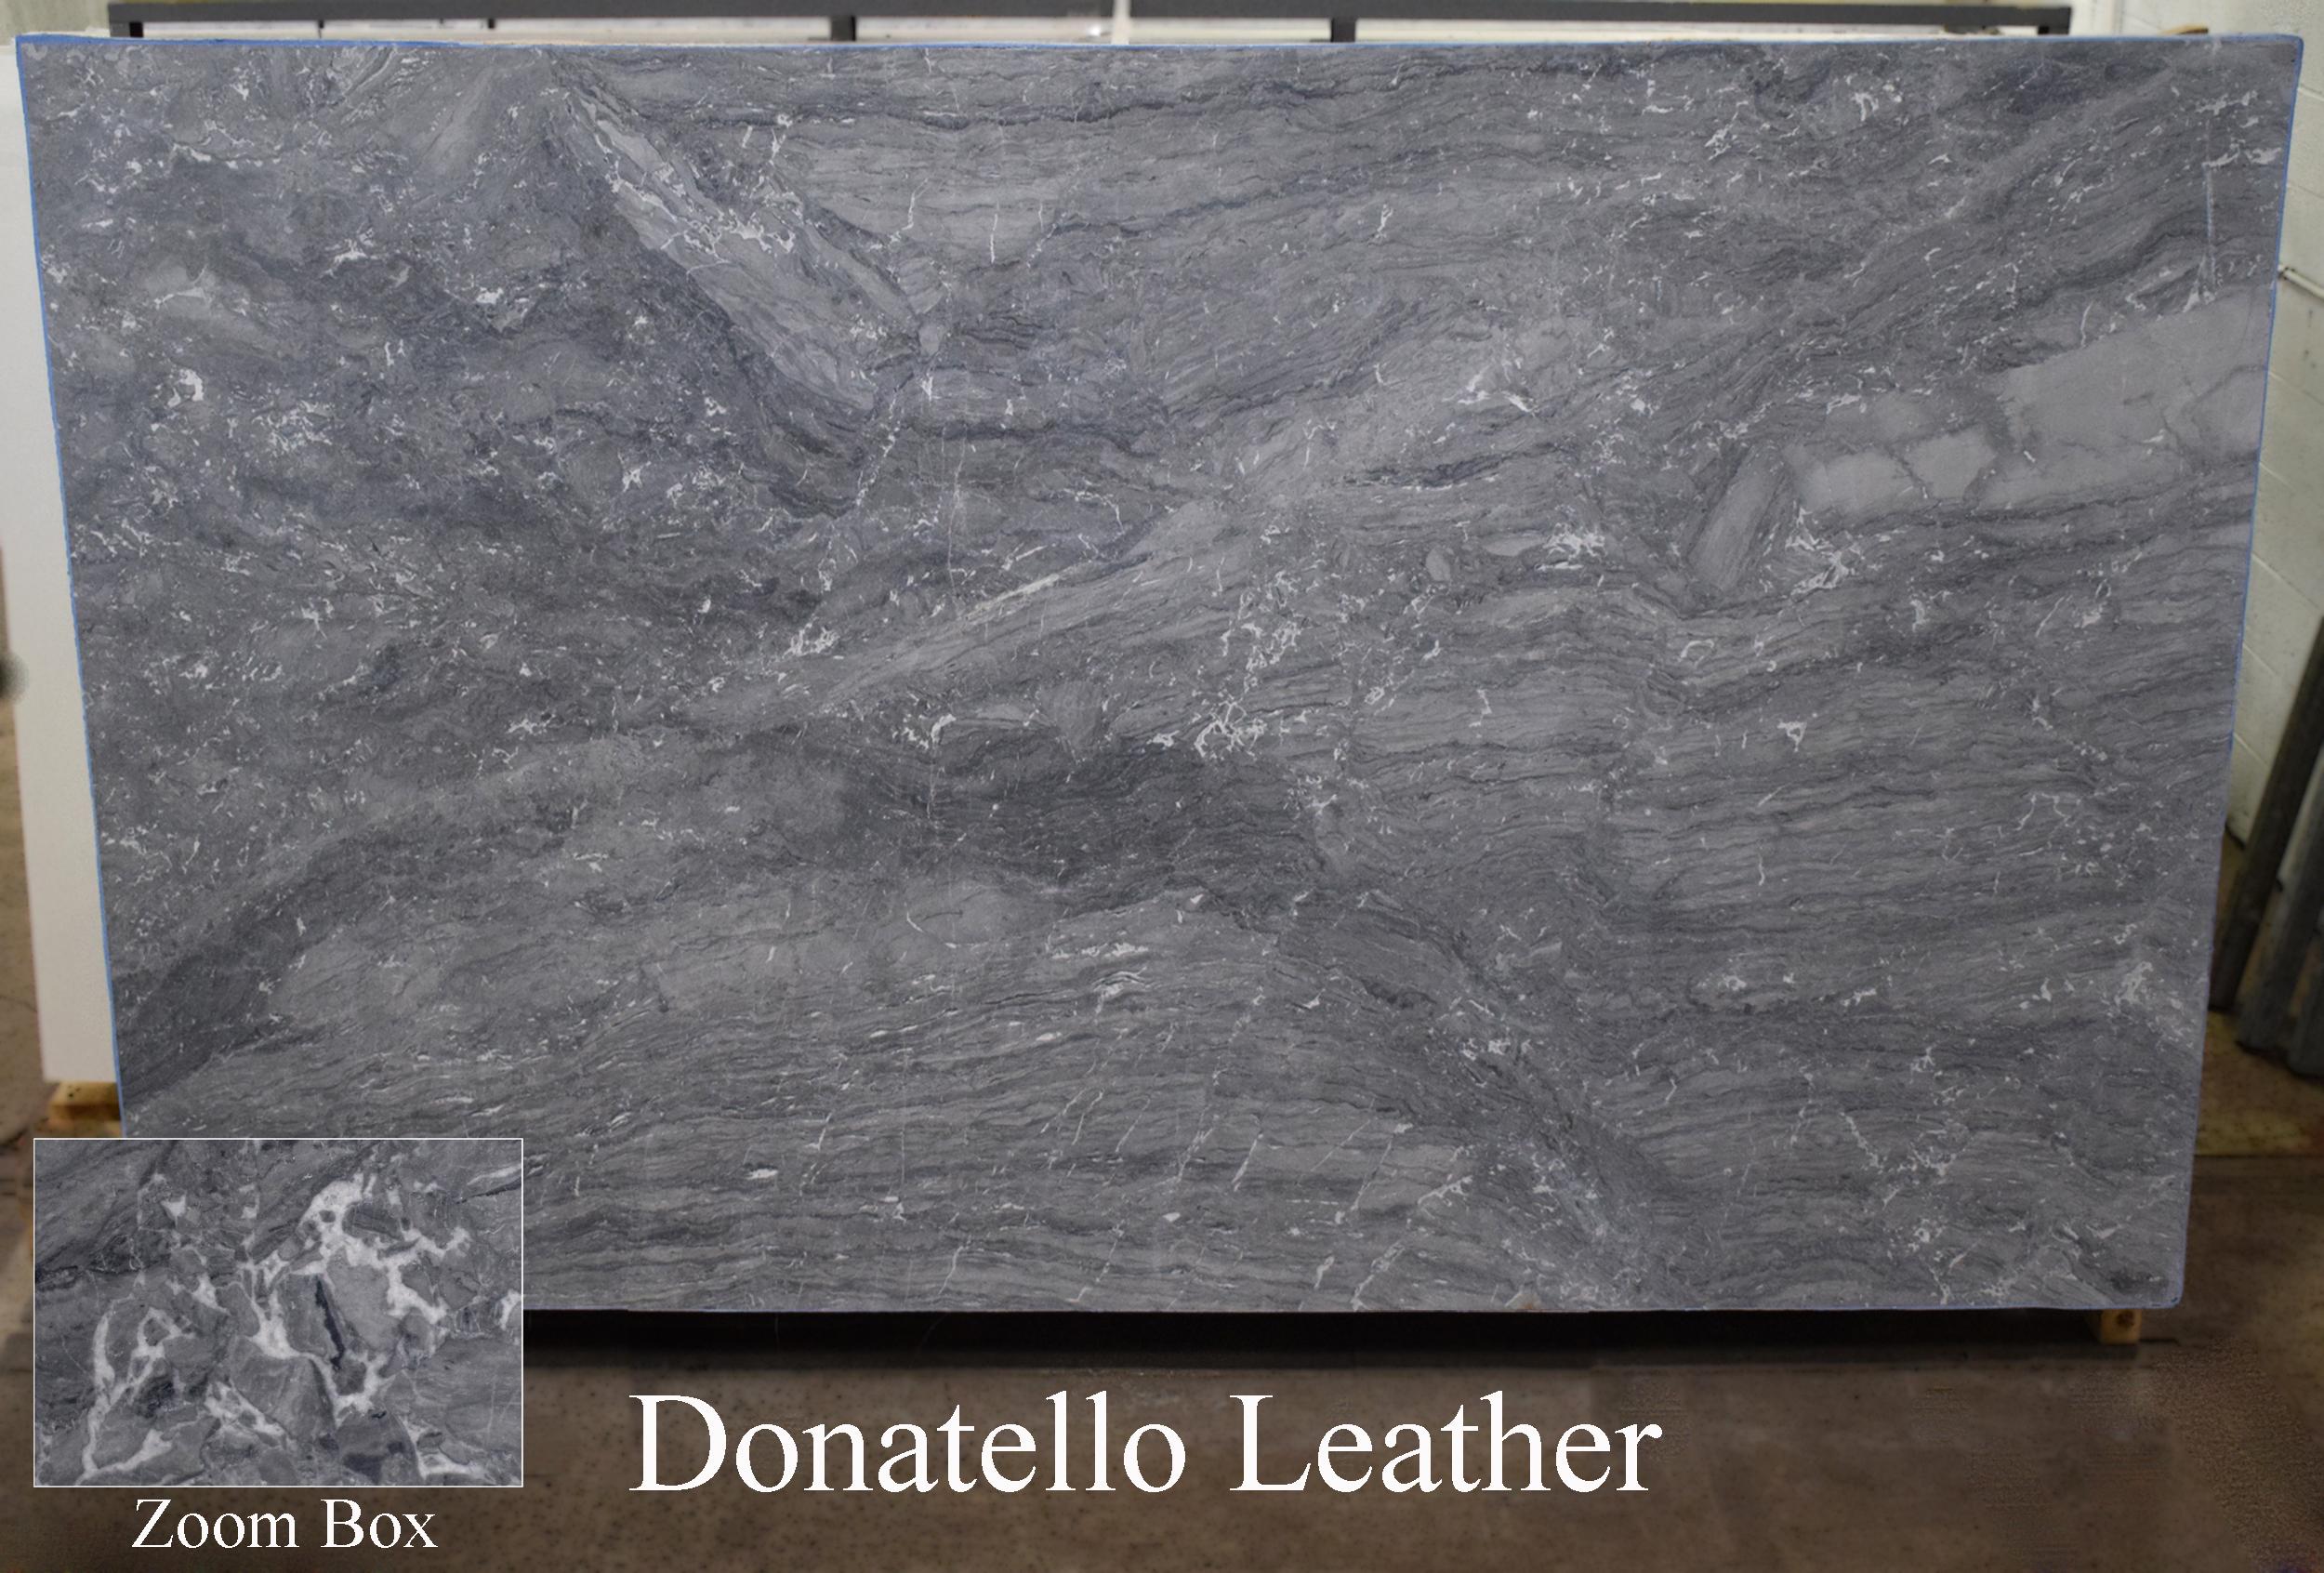 DONATELLO LEATHER